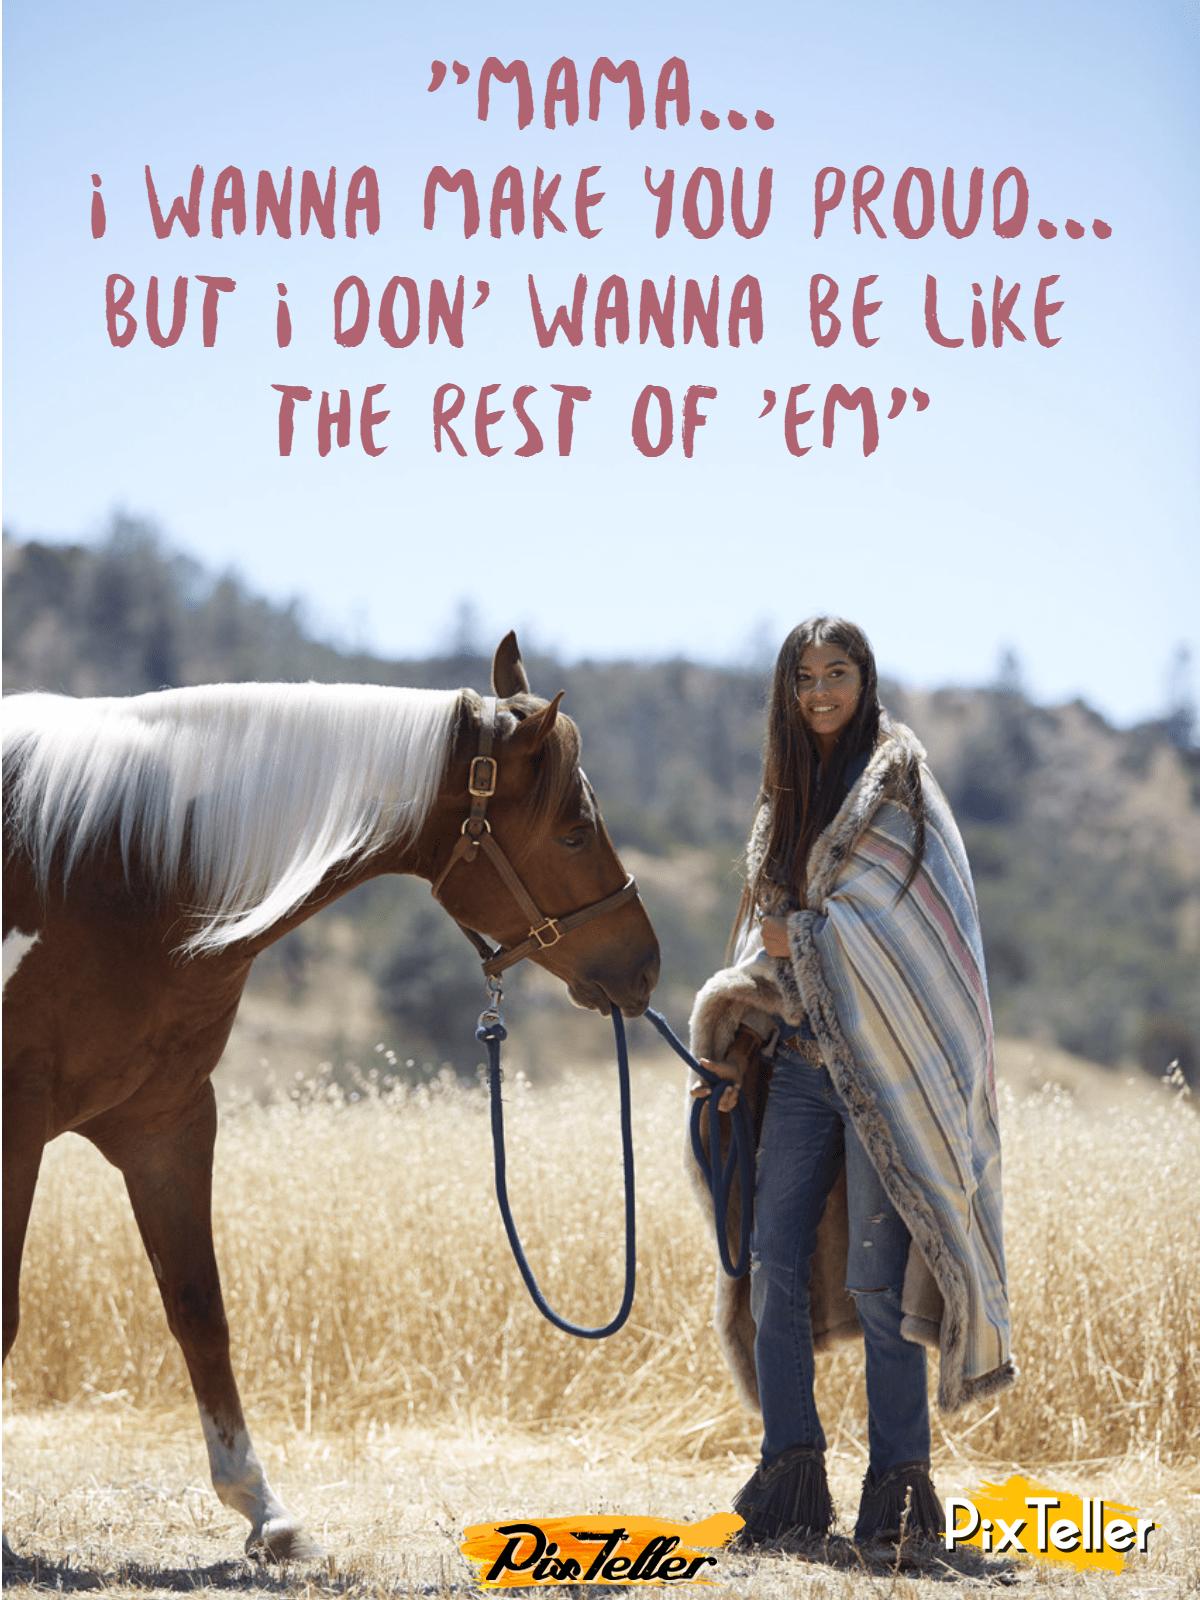 Horse,                Like,                Mammal,                Rein,                Supplies,                Bridle,                Stallion,                Mane,                Mustang,                Friendship,                Tack,                White,                Black,                 Free Image